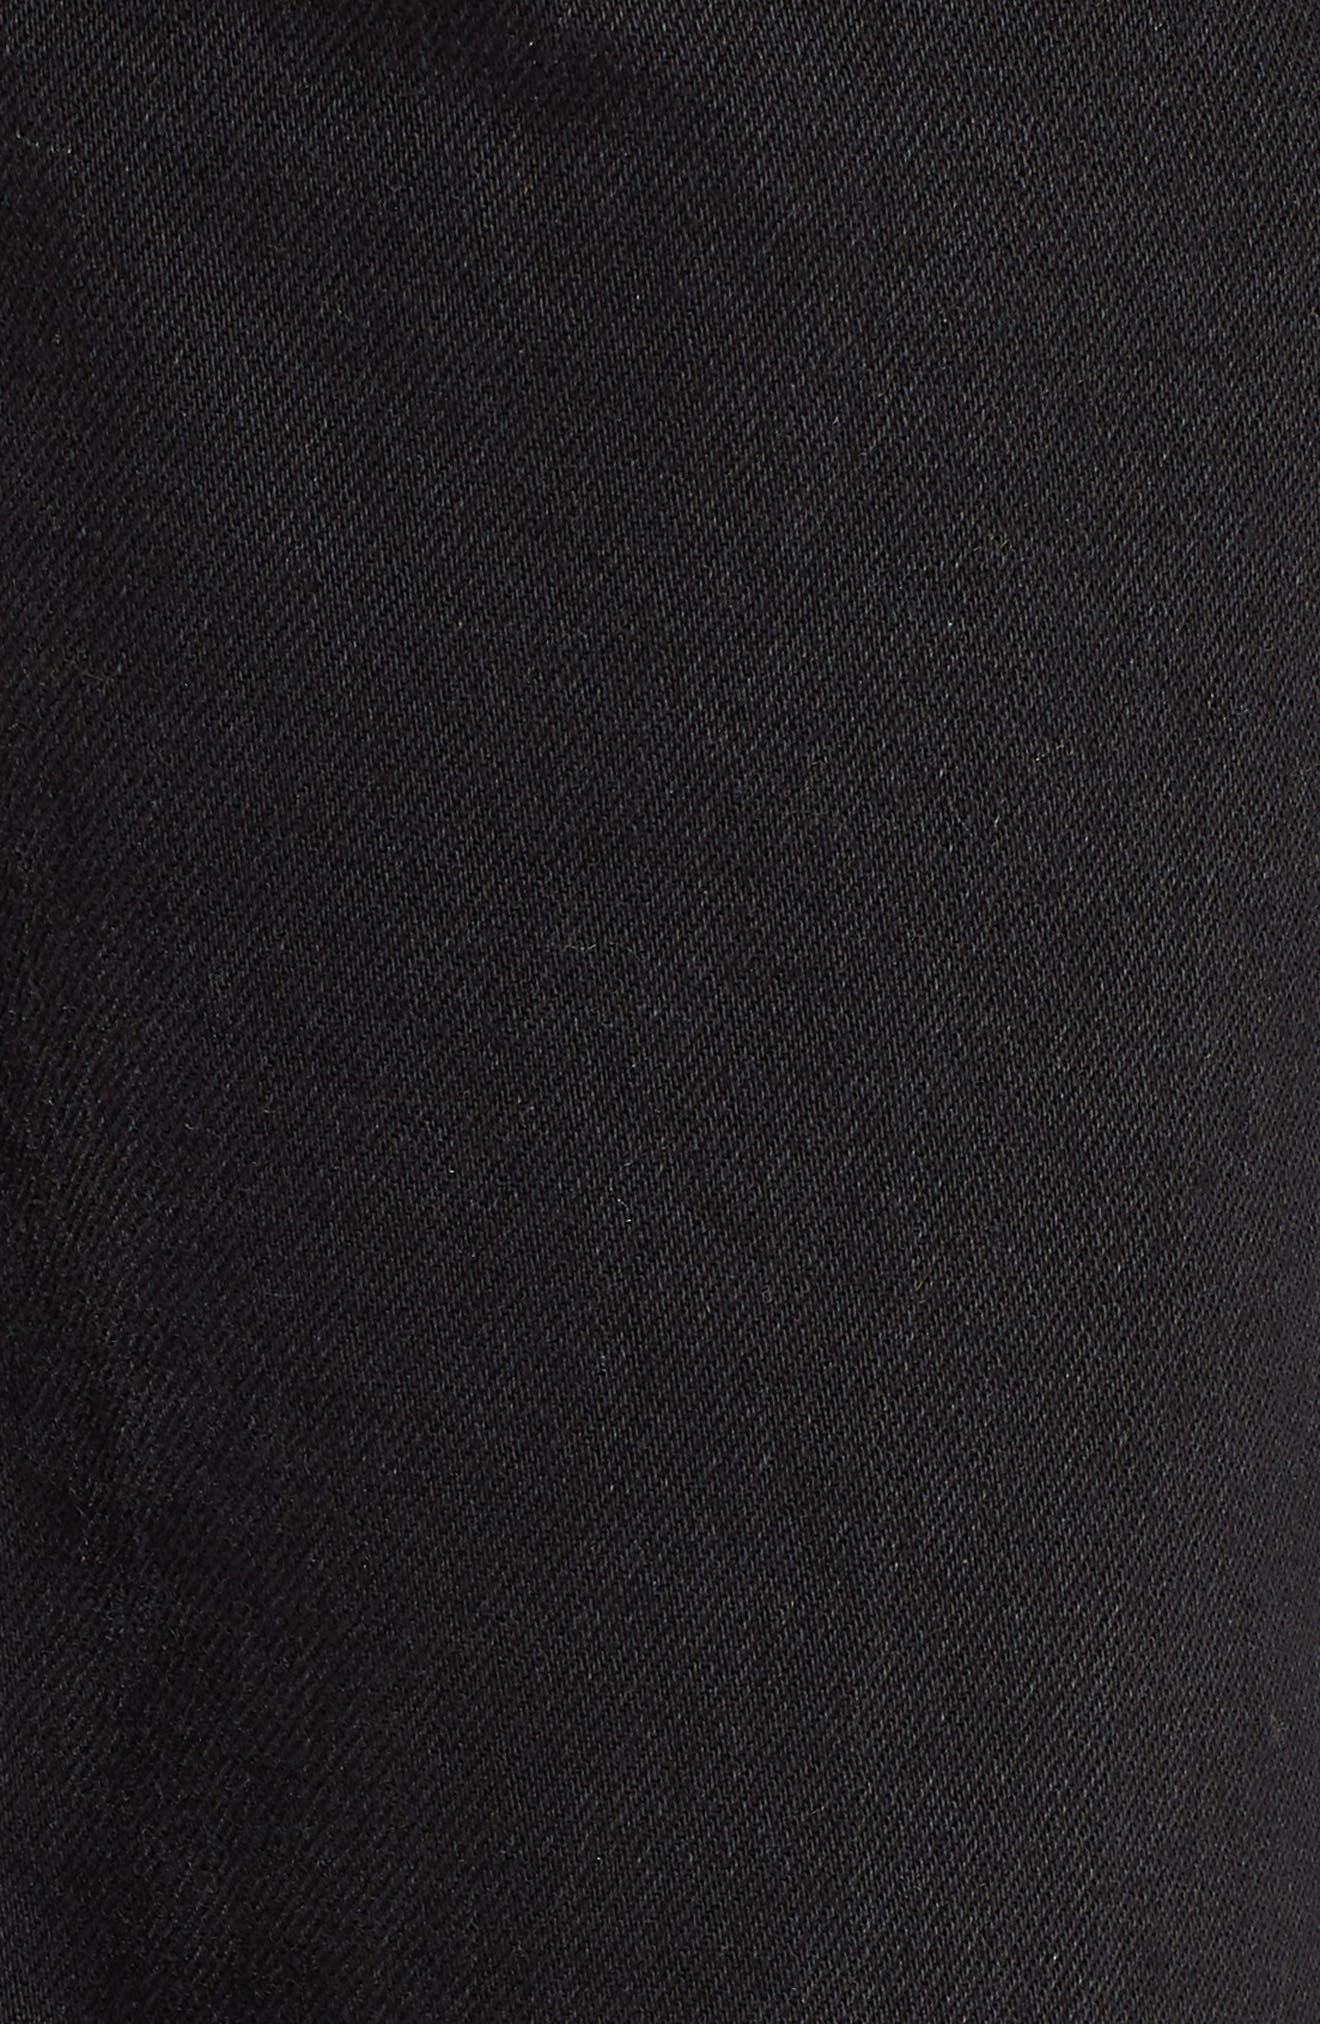 Stripe Hem Crop Jeans,                             Alternate thumbnail 6, color,                             003